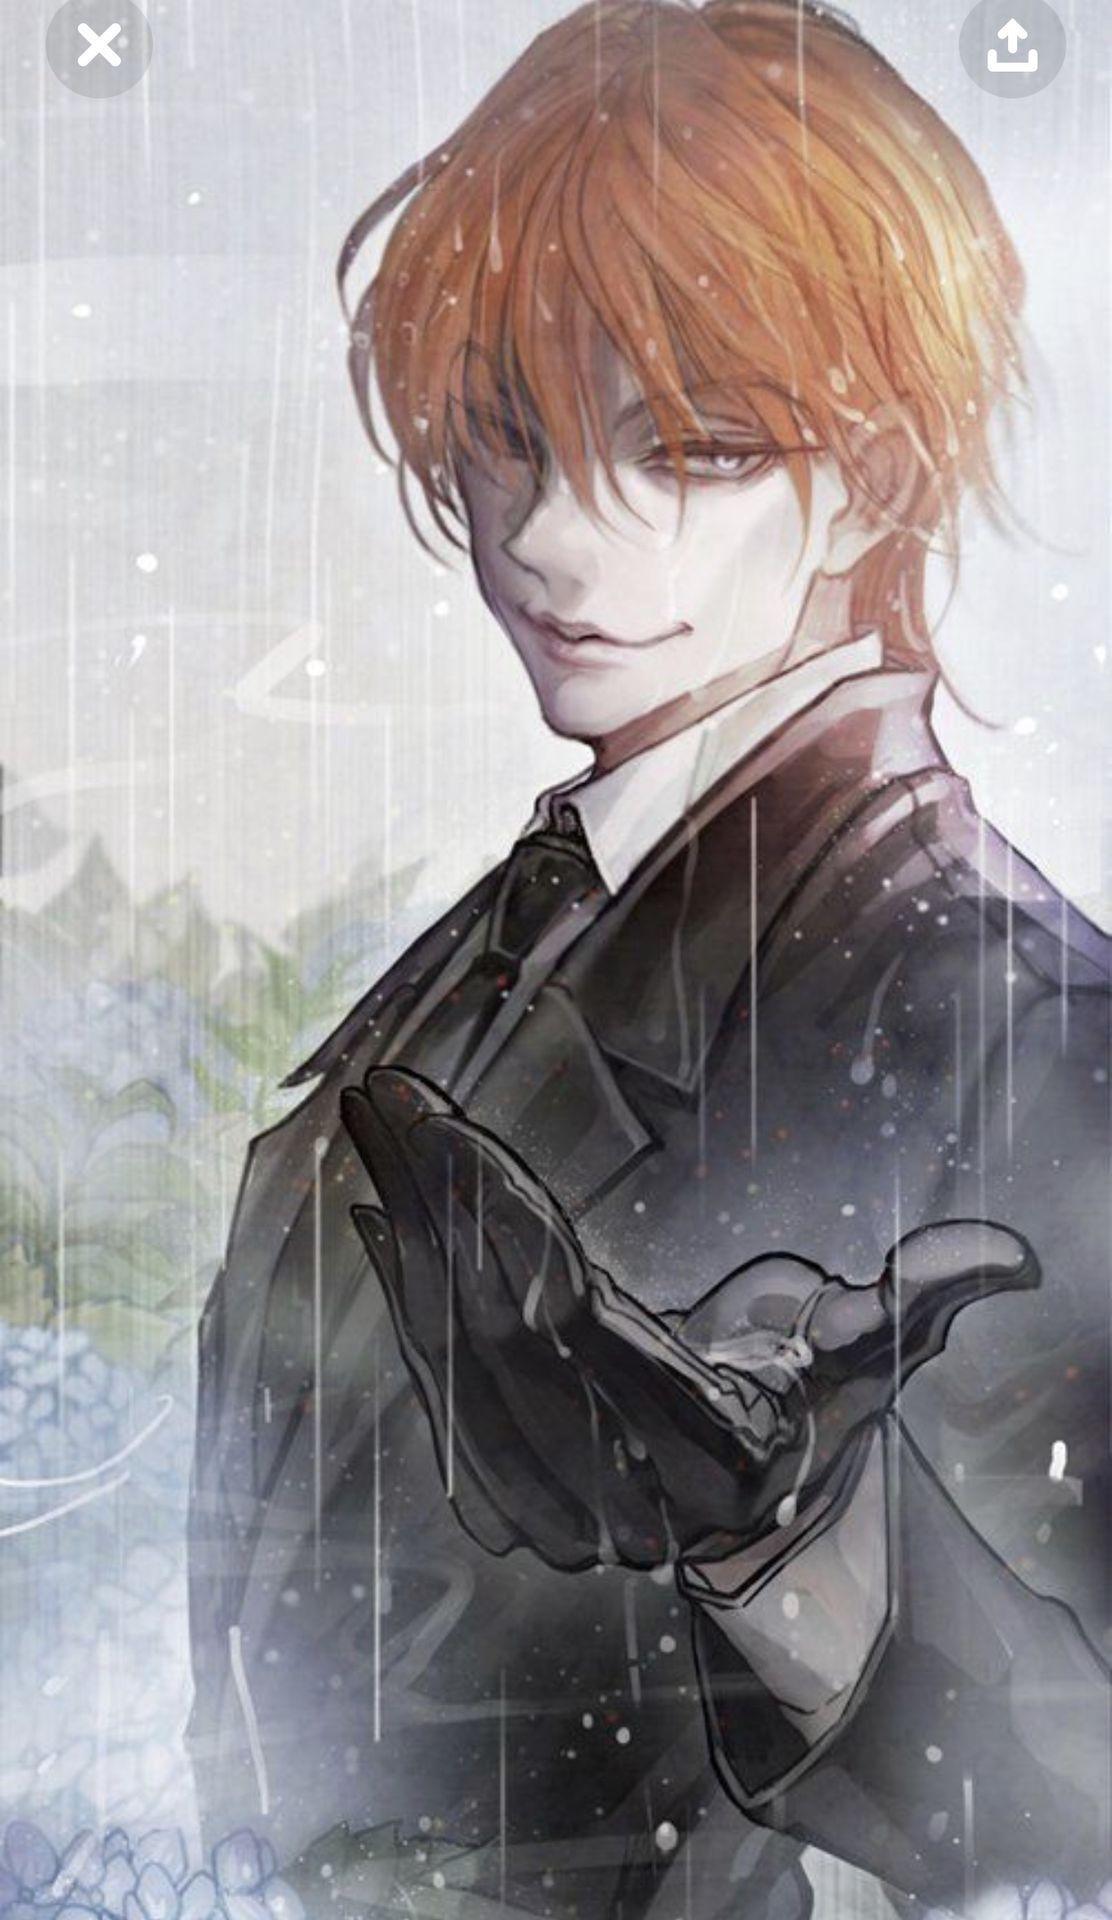 Illumi x hisoka x reader in 2020 hunter anime hisoka